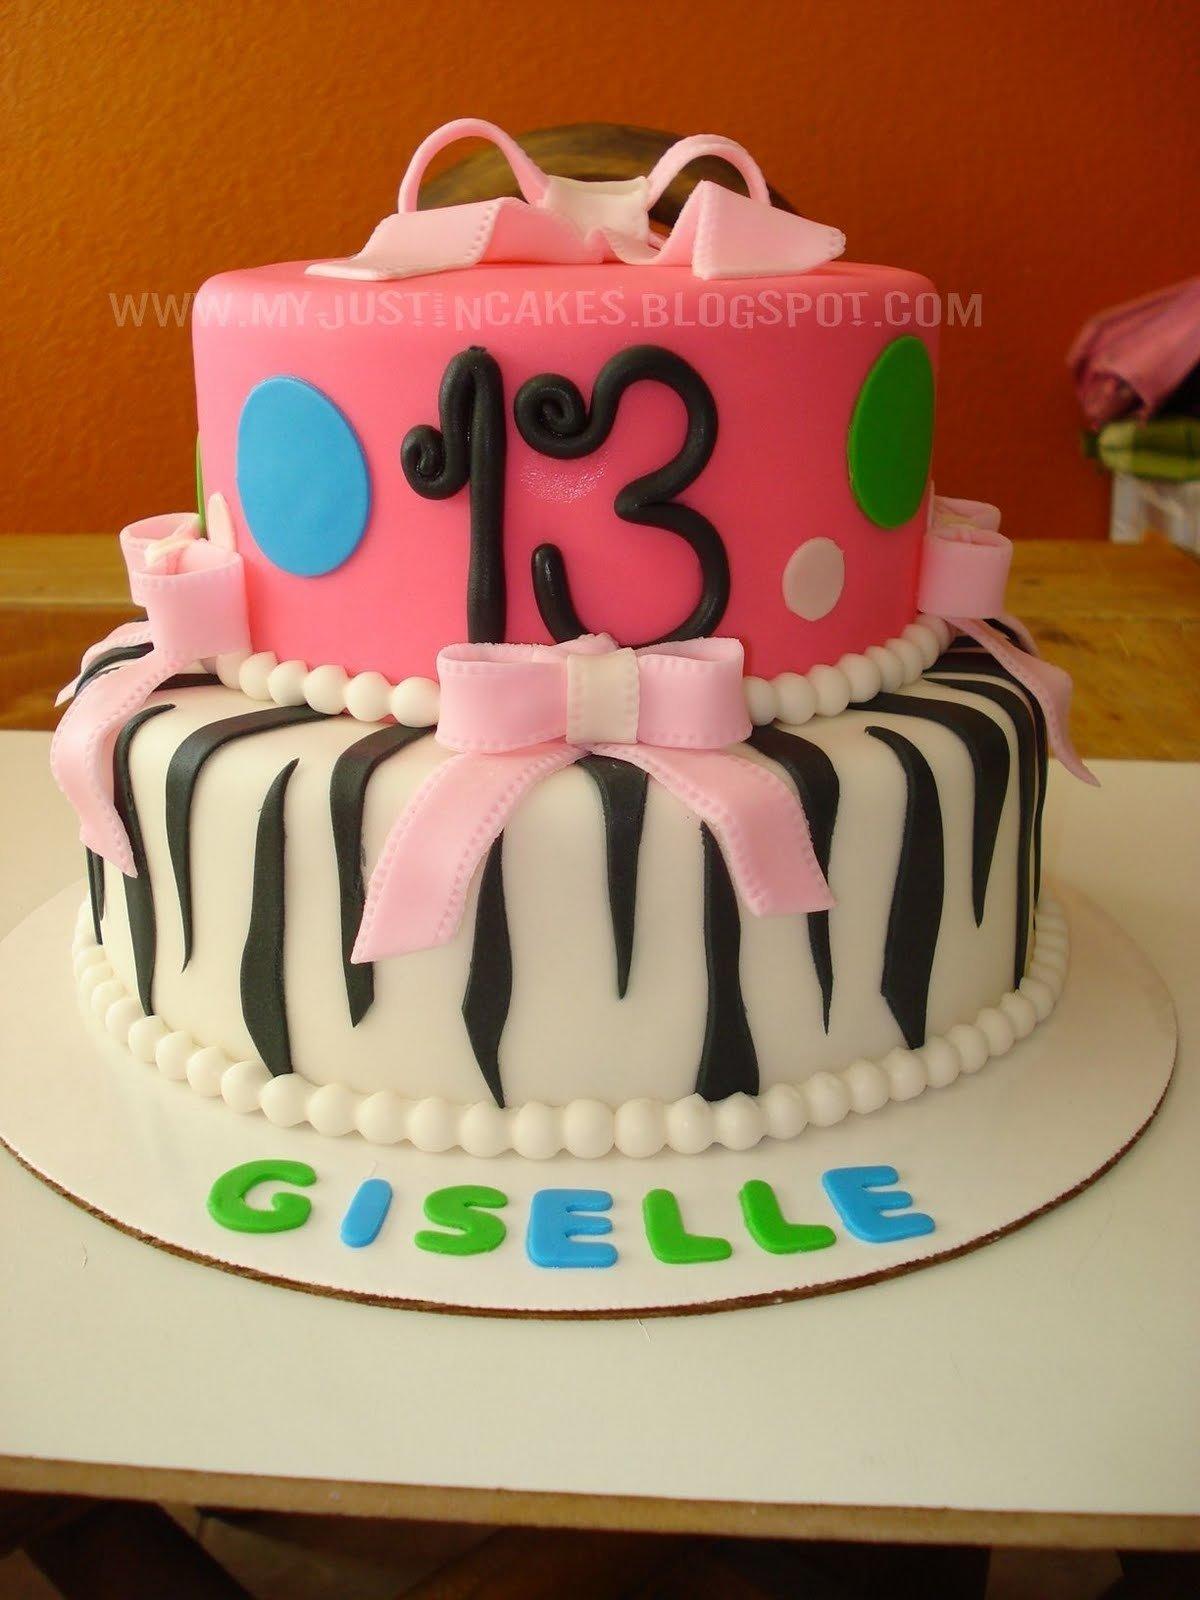 10 Lovable 13 Year Old Girl Birthday Party Ideas 75th birthday party ideas for mom tags 75th birthday party ideas